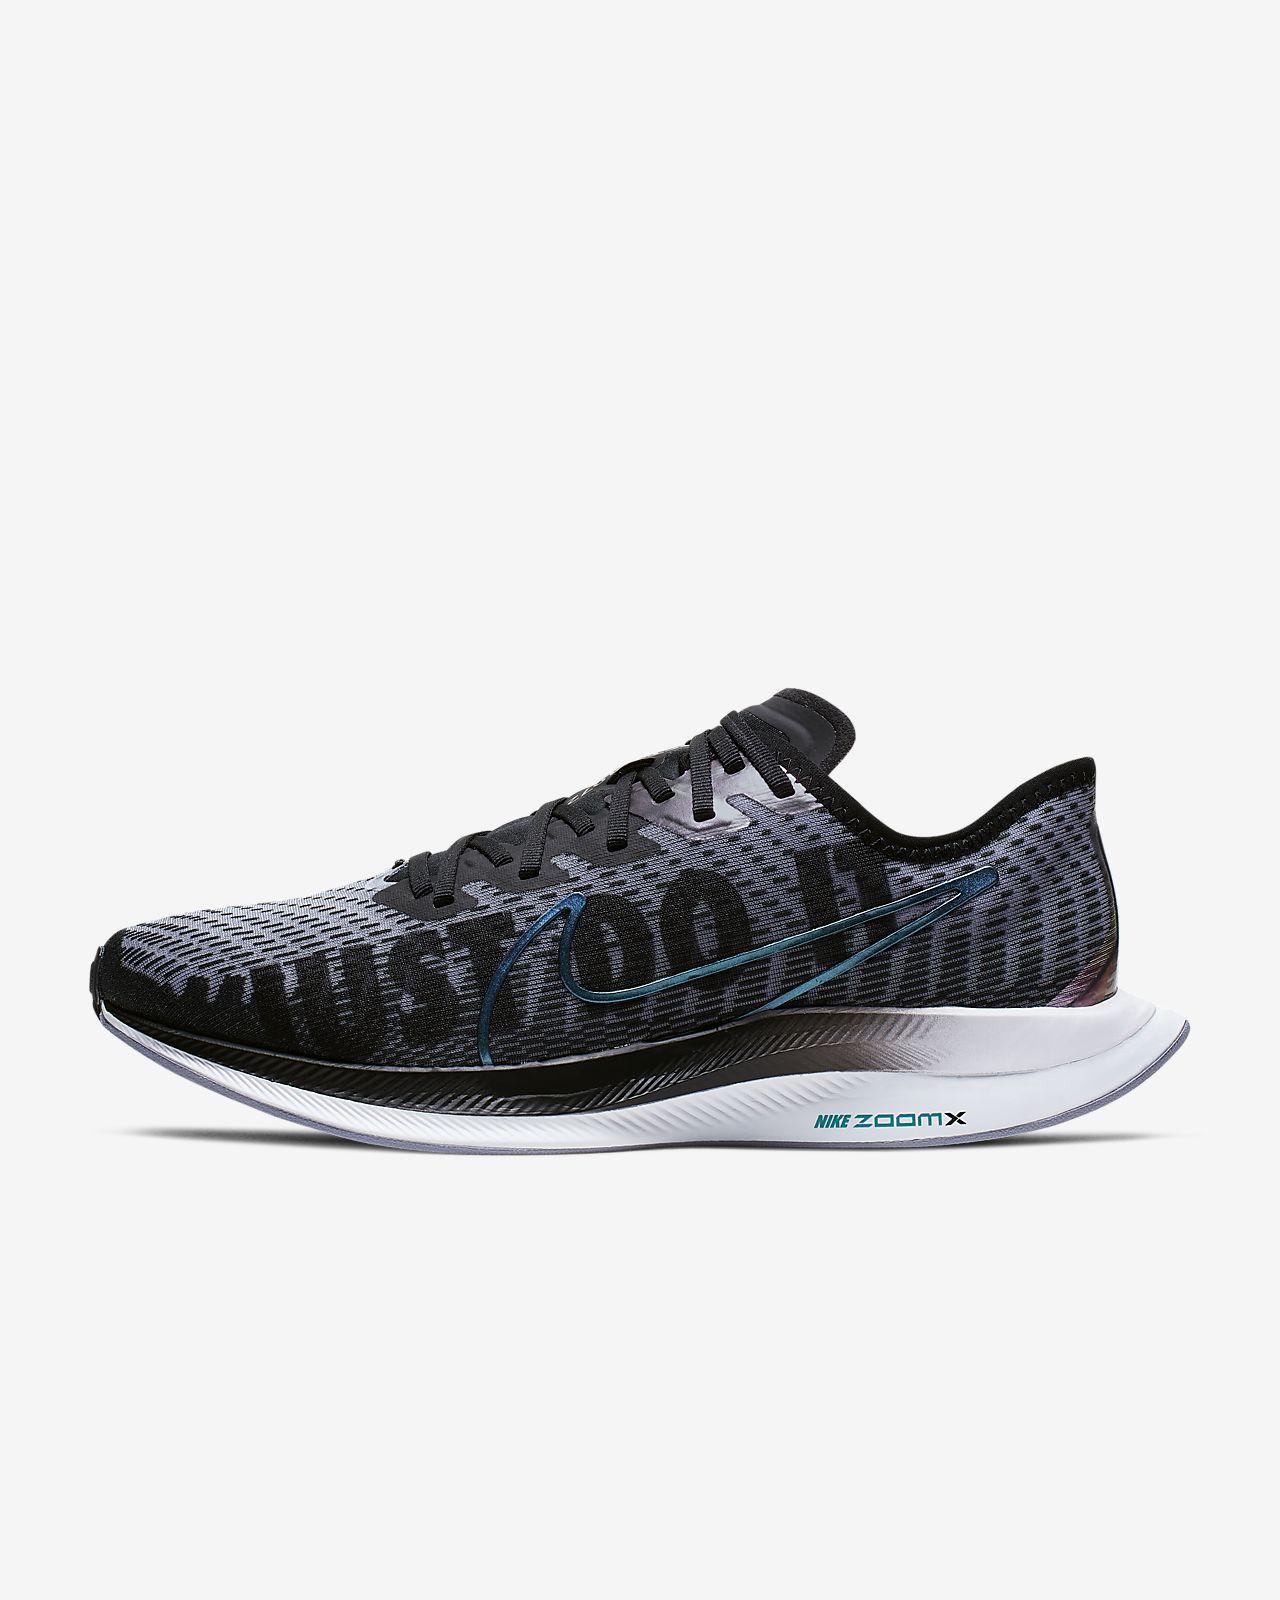 Chaussure de running Nike Zoom Pegasus Turbo 2 Rise pour Femme